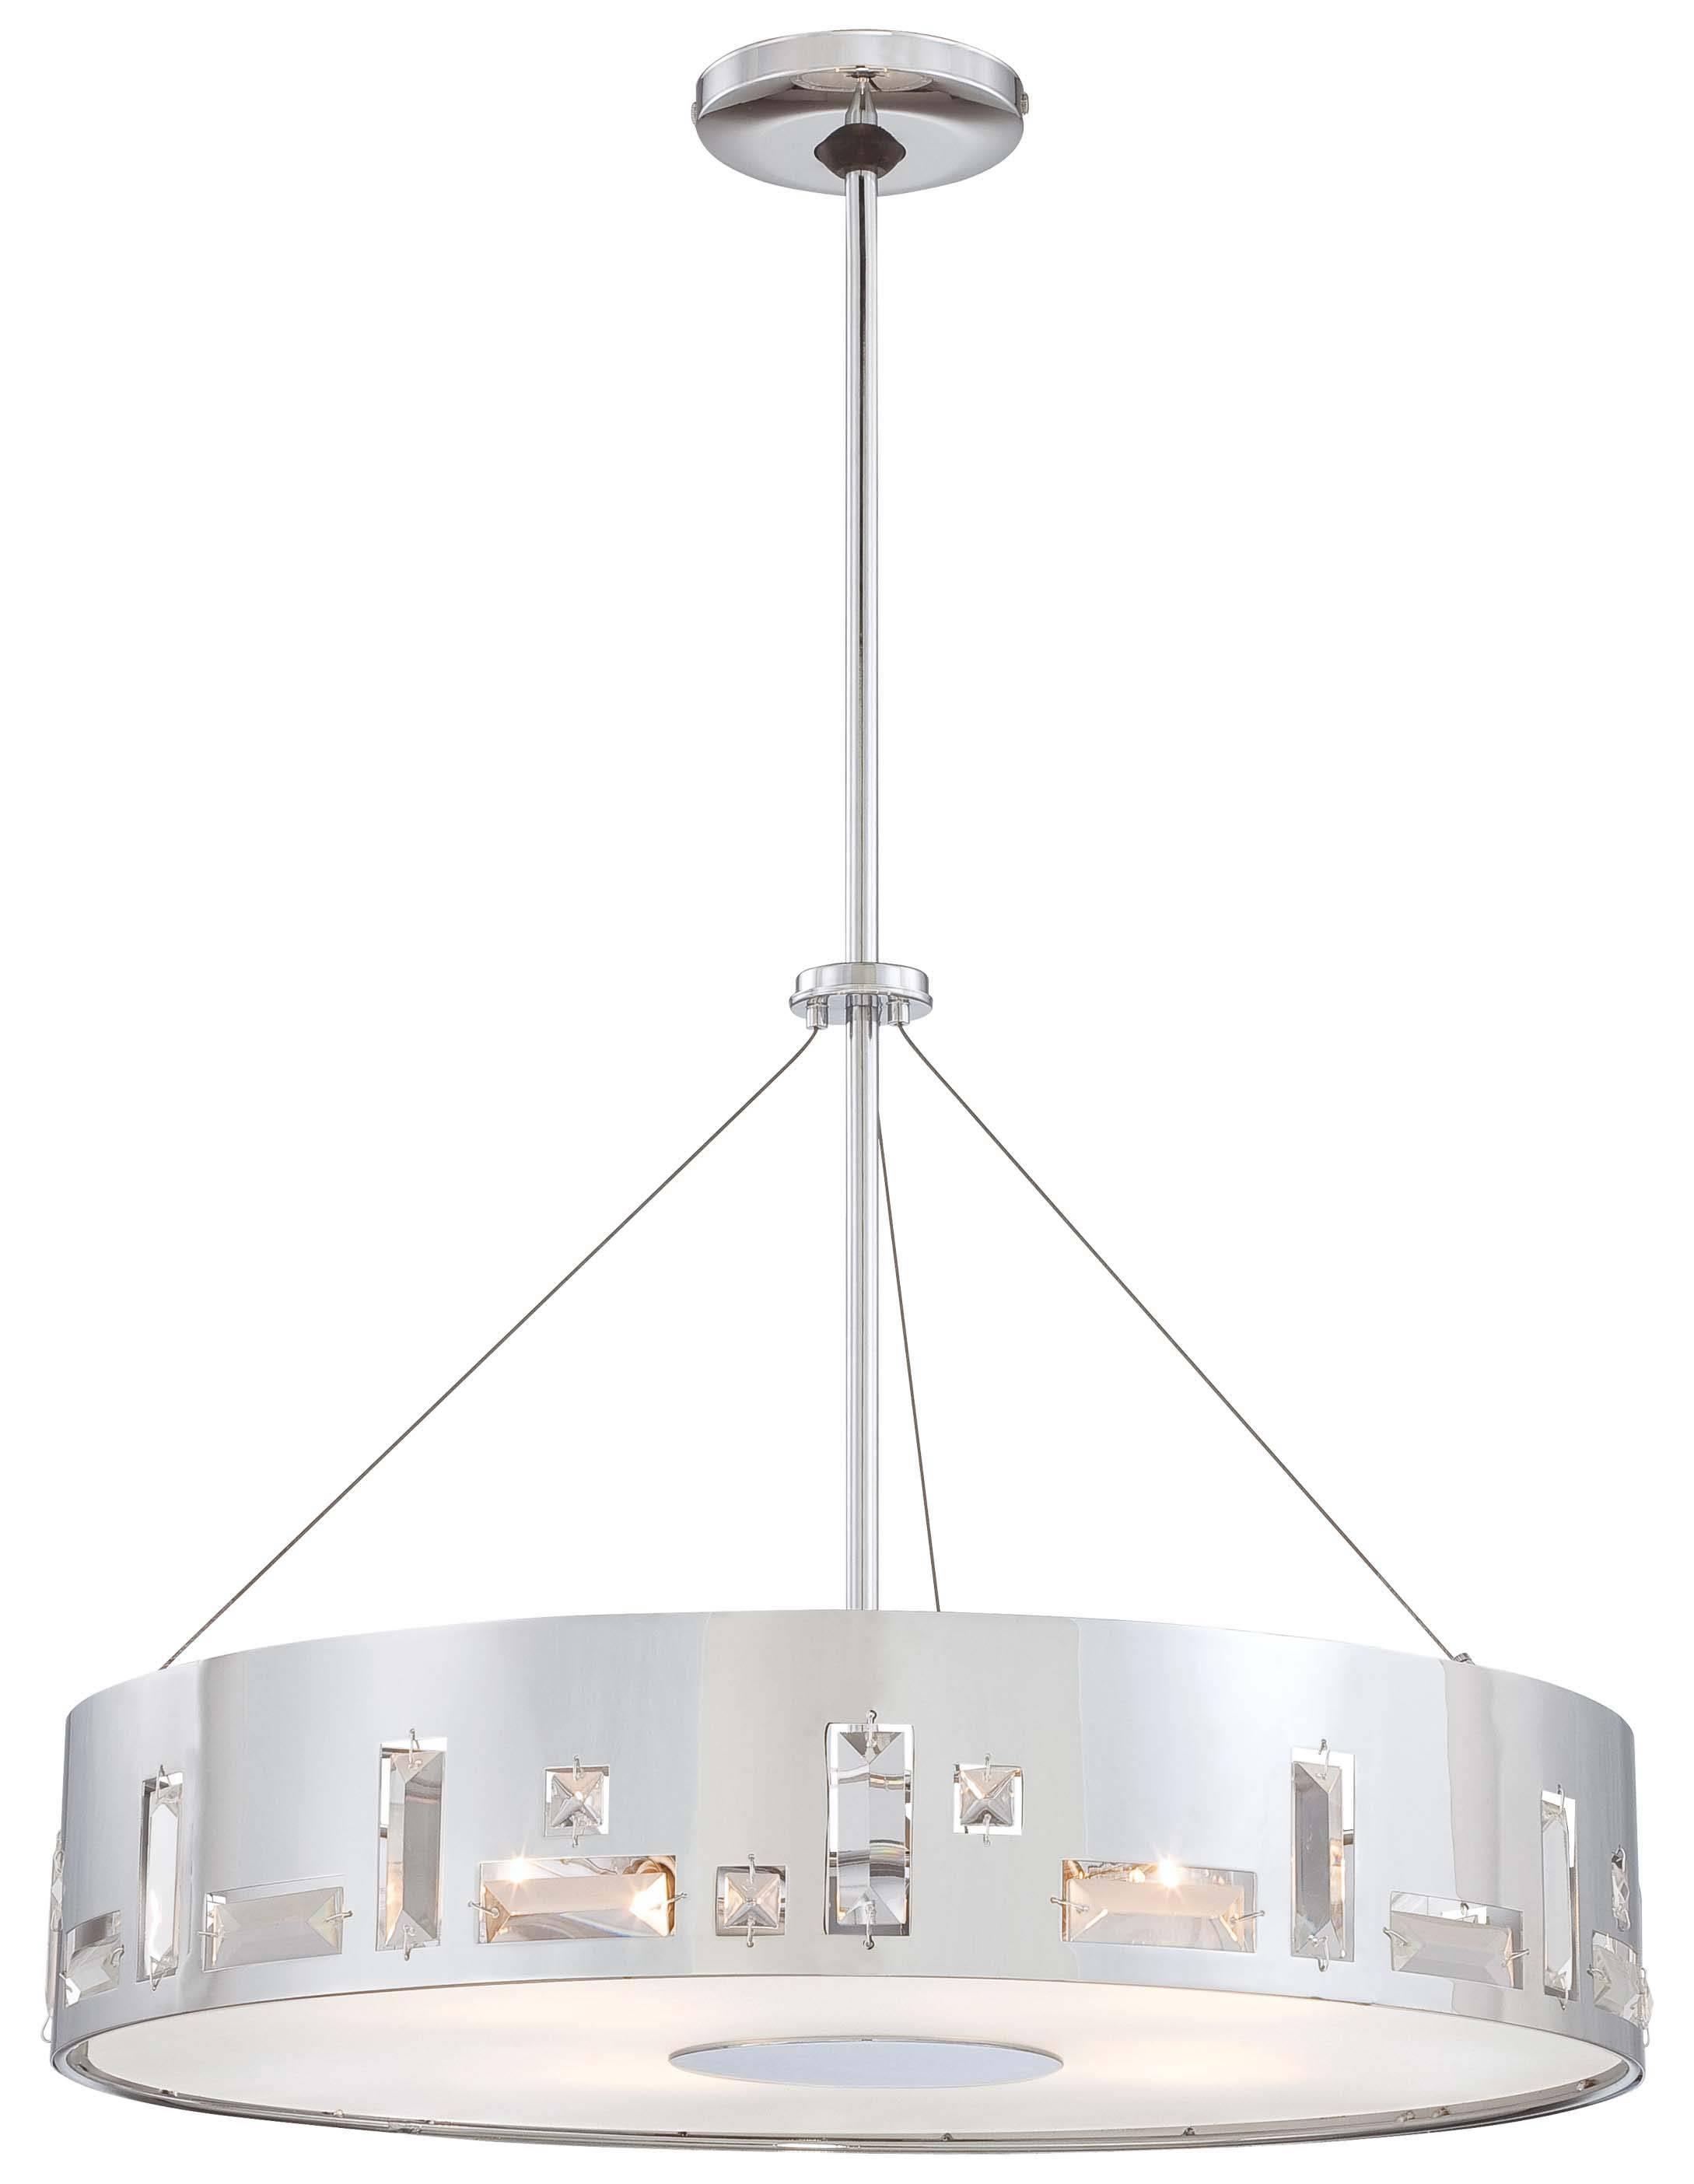 2018 best of halo track lighting pendants pendant lighting minimalist moravian star light circa lighting in halo track lighting pendants aloadofball Choice Image